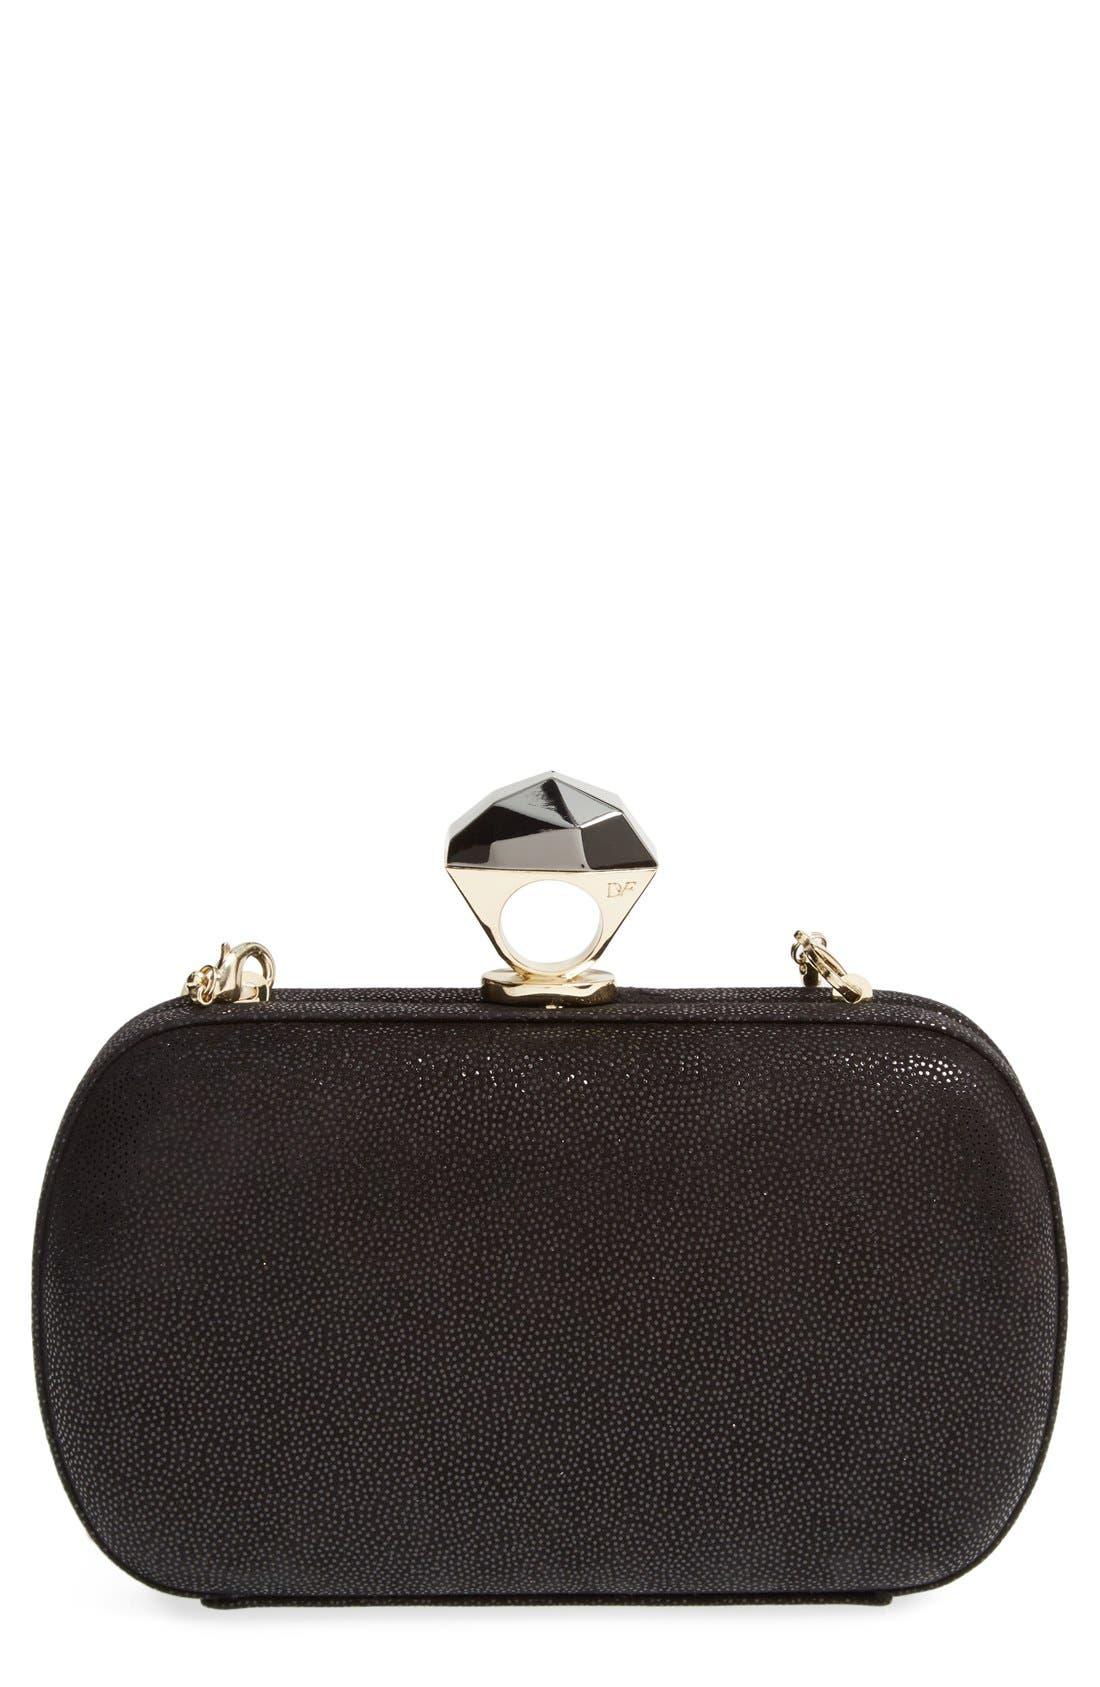 Alternate Image 1 Selected - Diane von Furstenberg 'Powerstone Sparkle Caviar' Leather Minaudiere